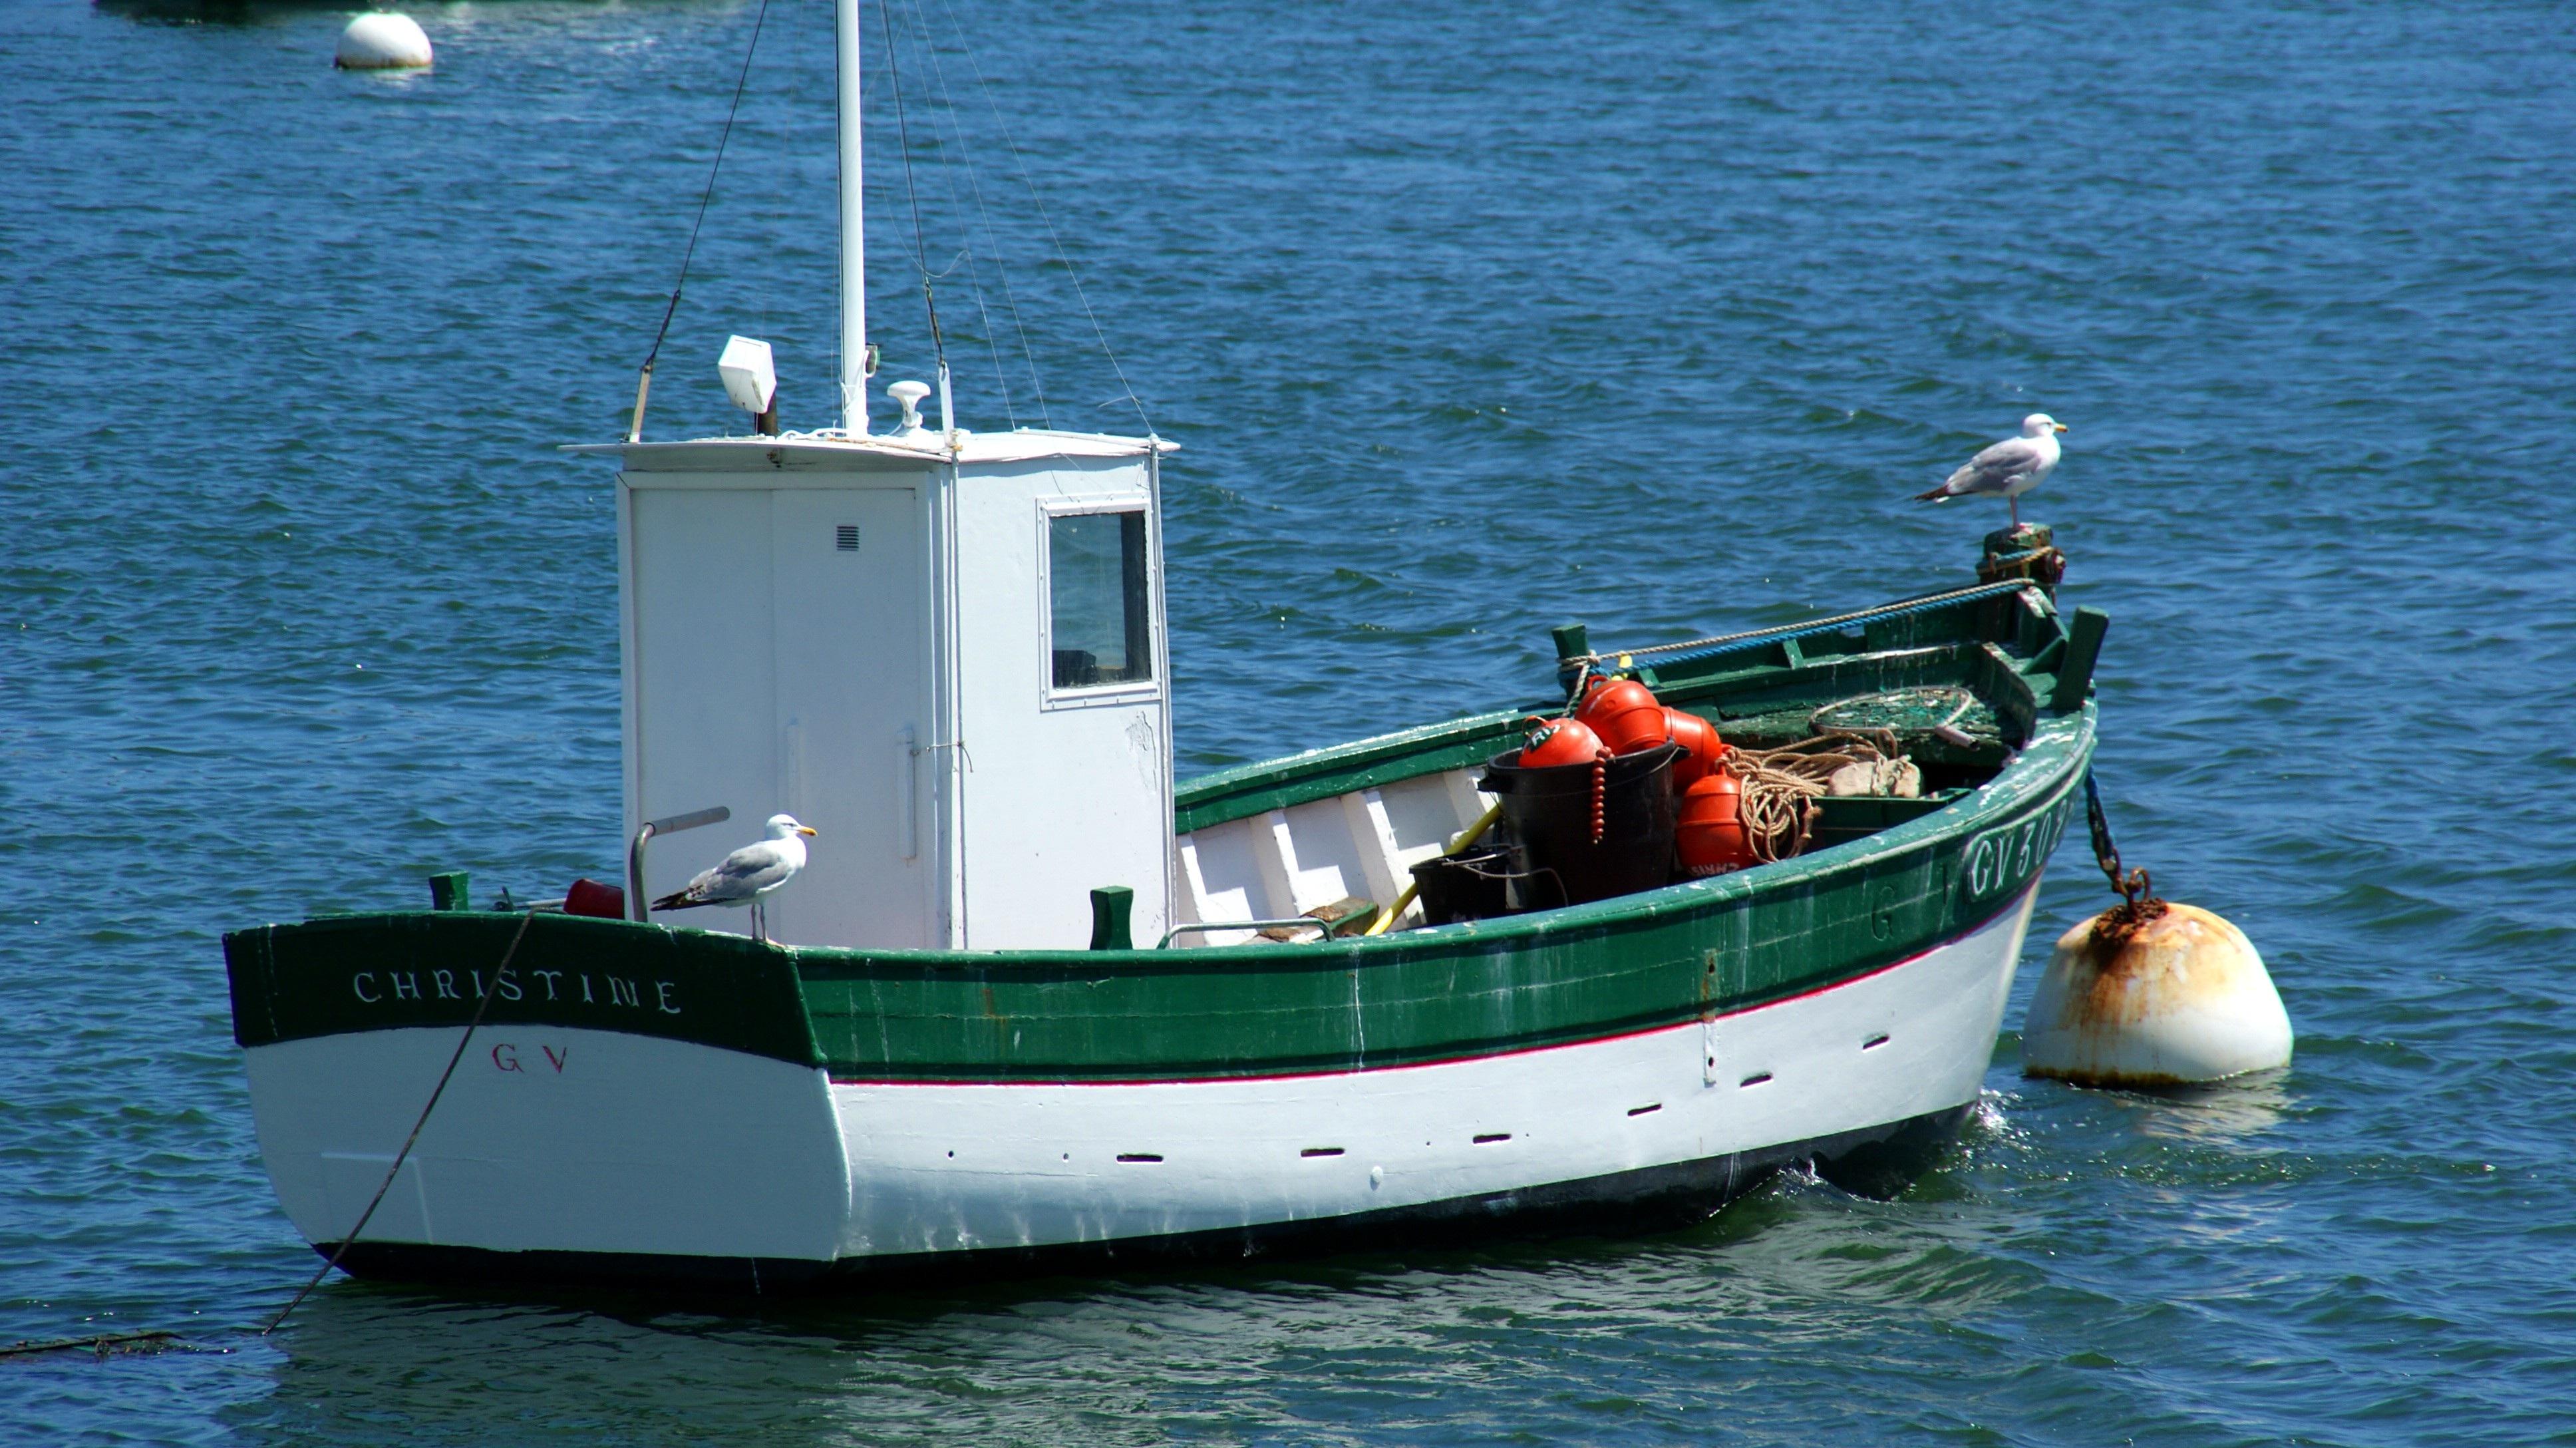 Top Images Gratuites : mer, côte, océan, navire, France, véhicule  ED56